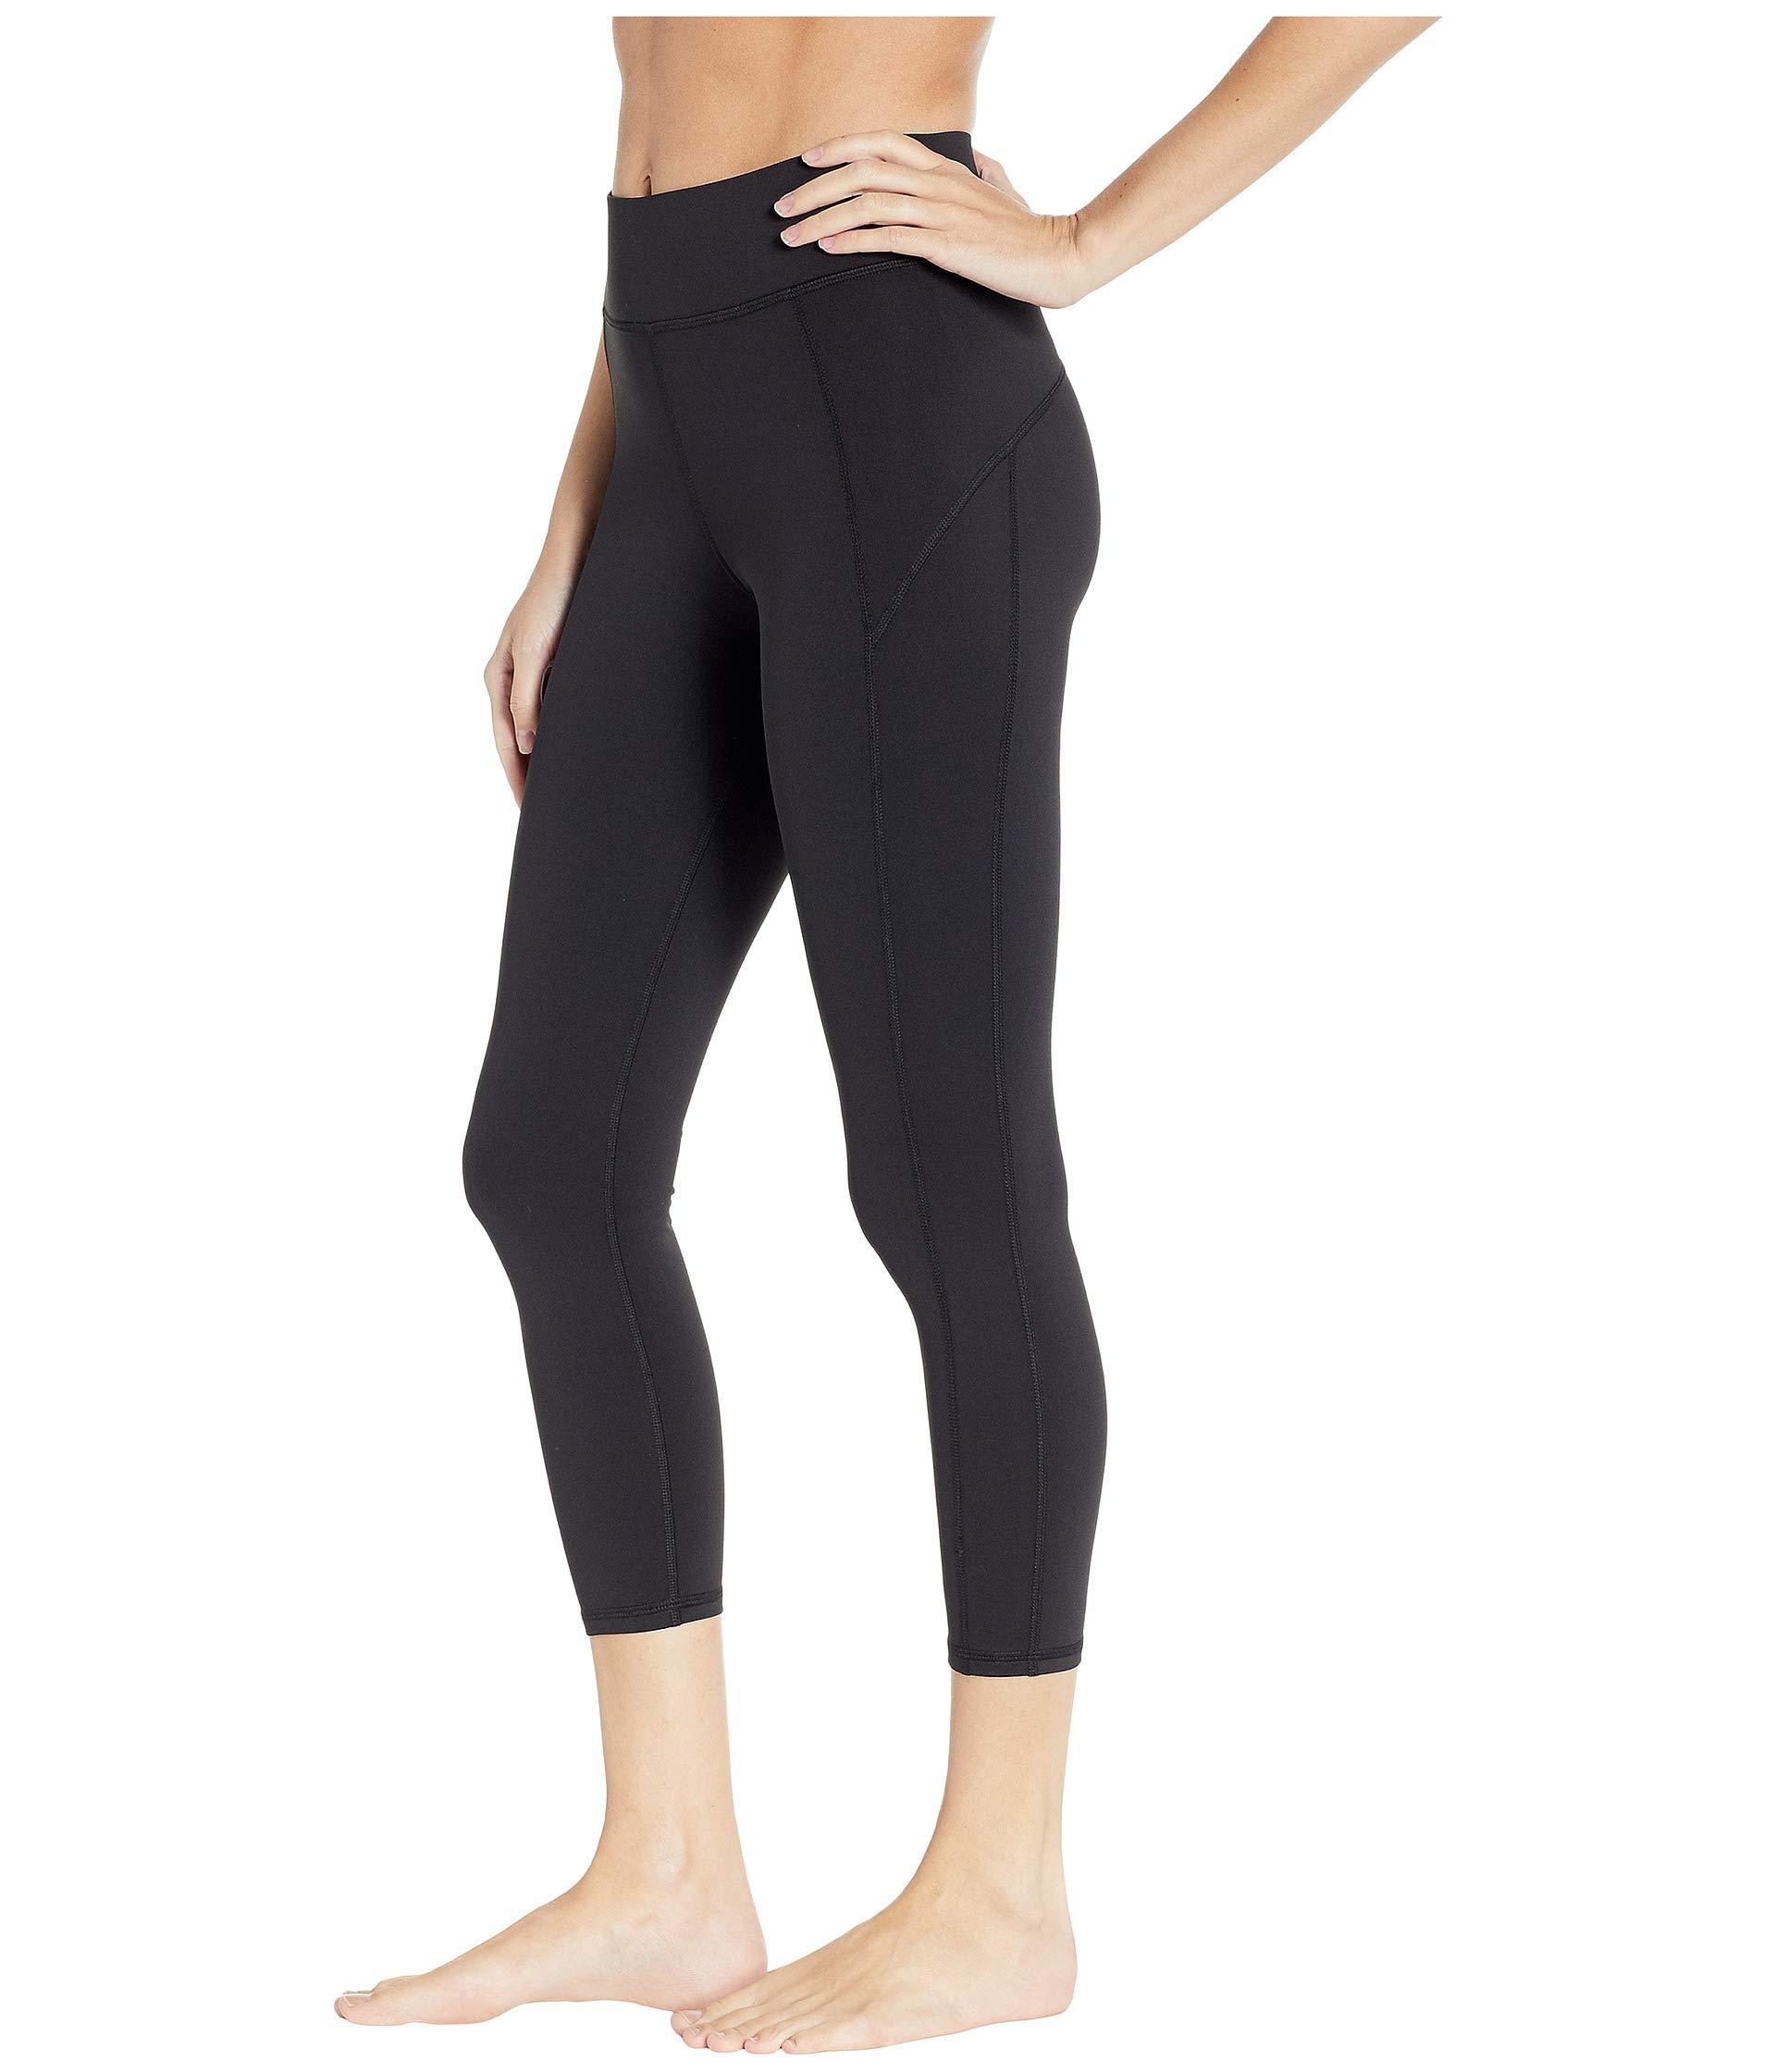 7d20834e6a Lyst - Michi Lotus Crop Leggings (black) Women's Casual Pants in Black